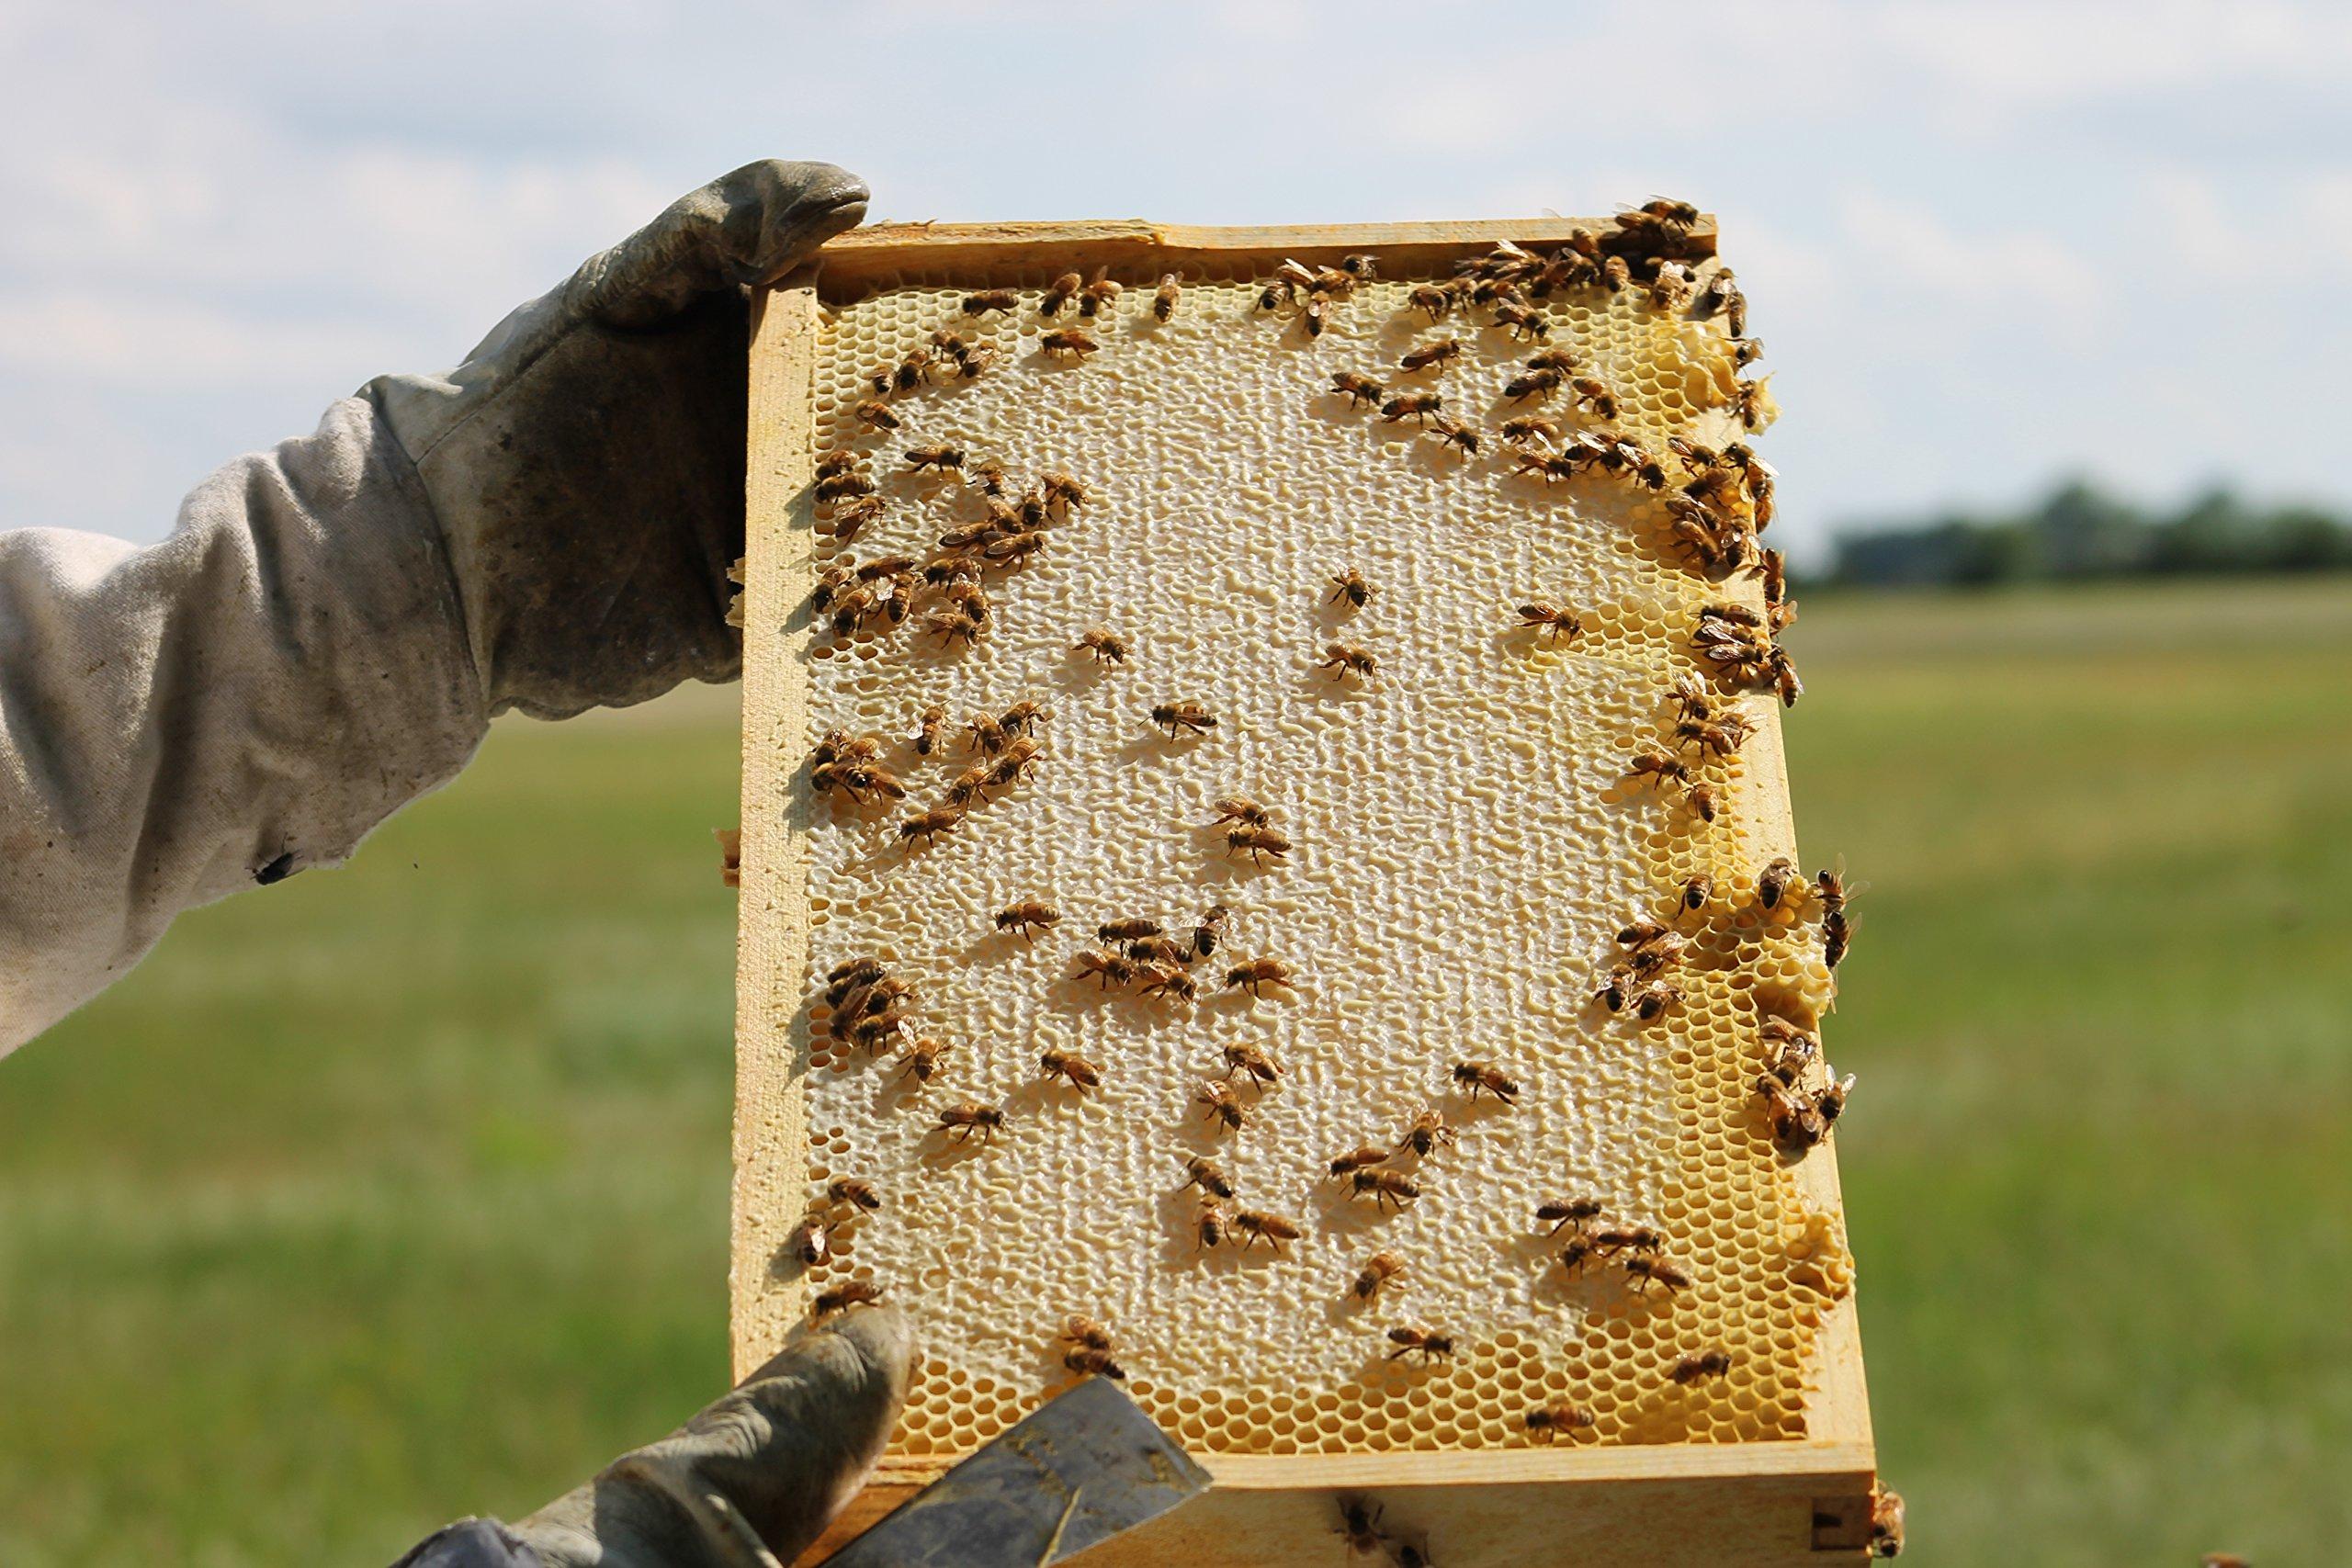 Raw Honey Pure Natural Nebraska Honey One 2lb Jar by Prairie River Honey Farm (Image #4)